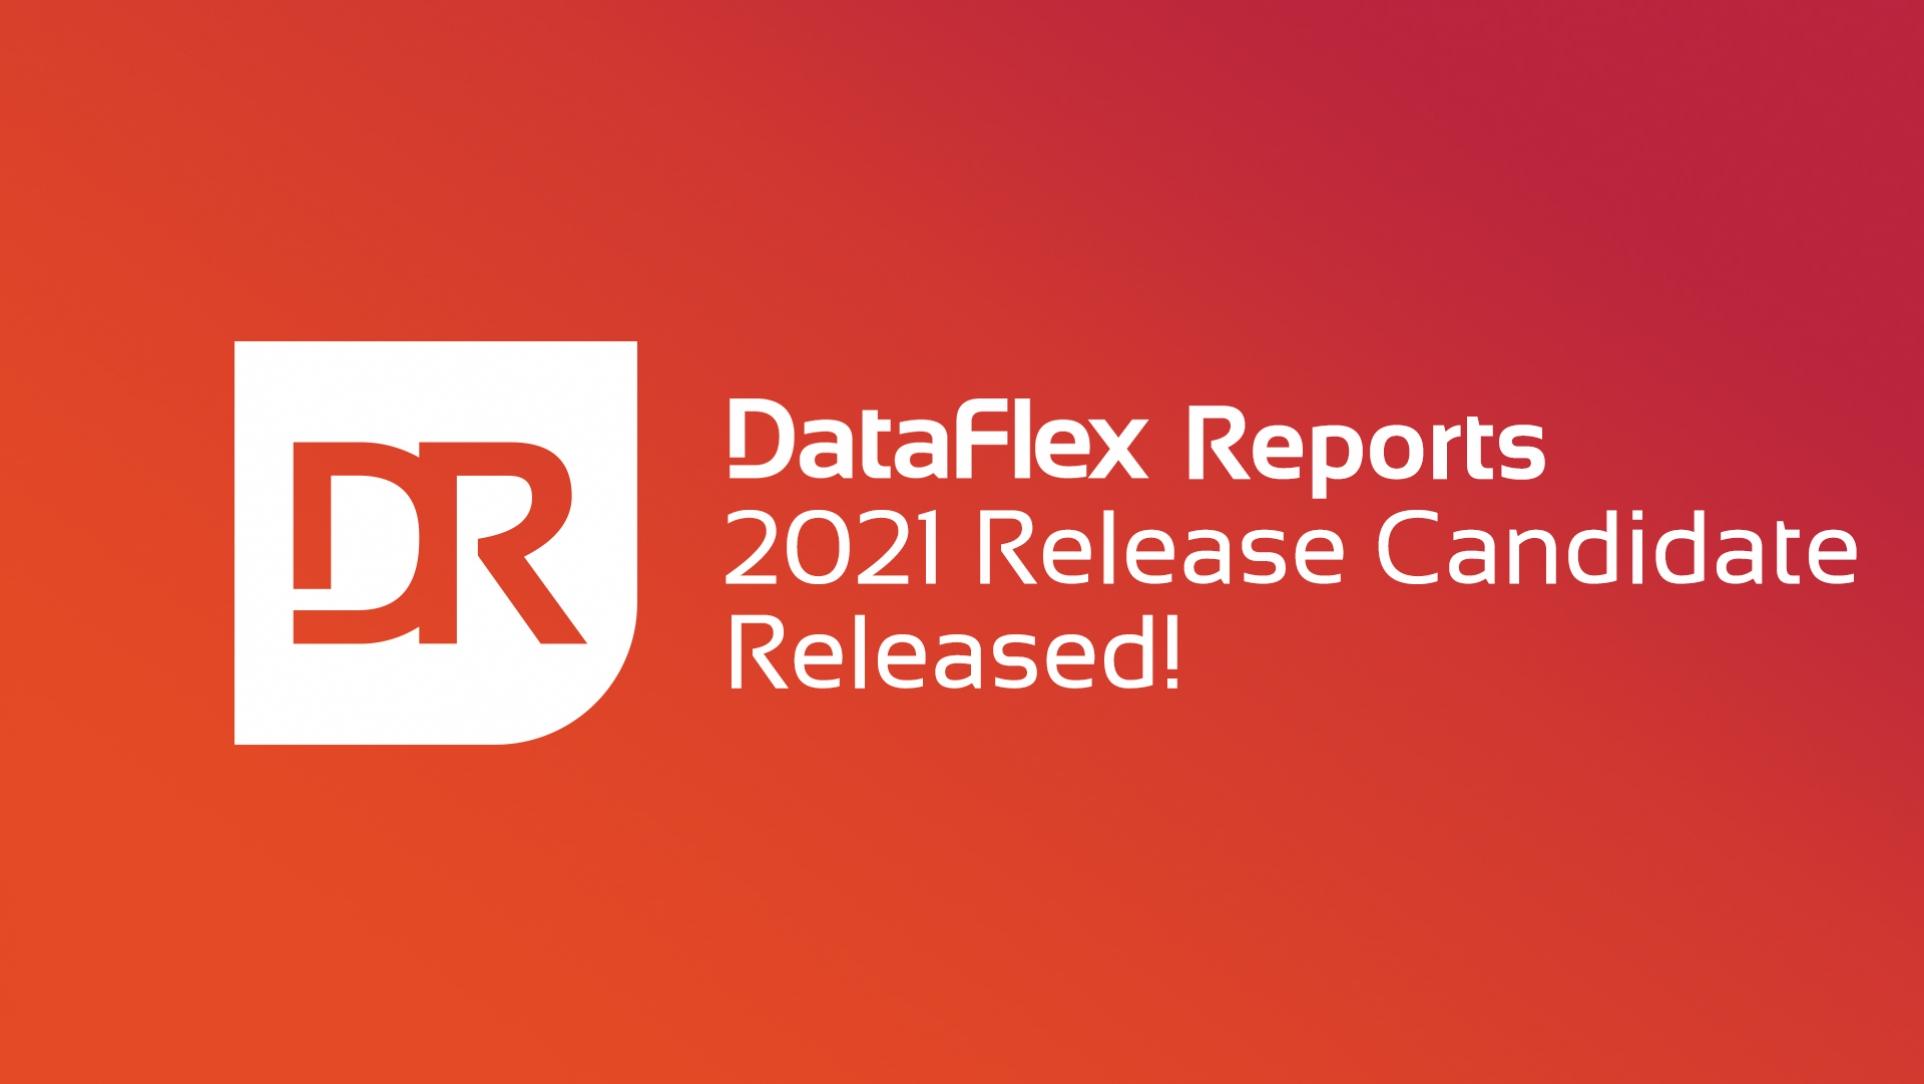 DataFlex Reports 2021 Release Candidate